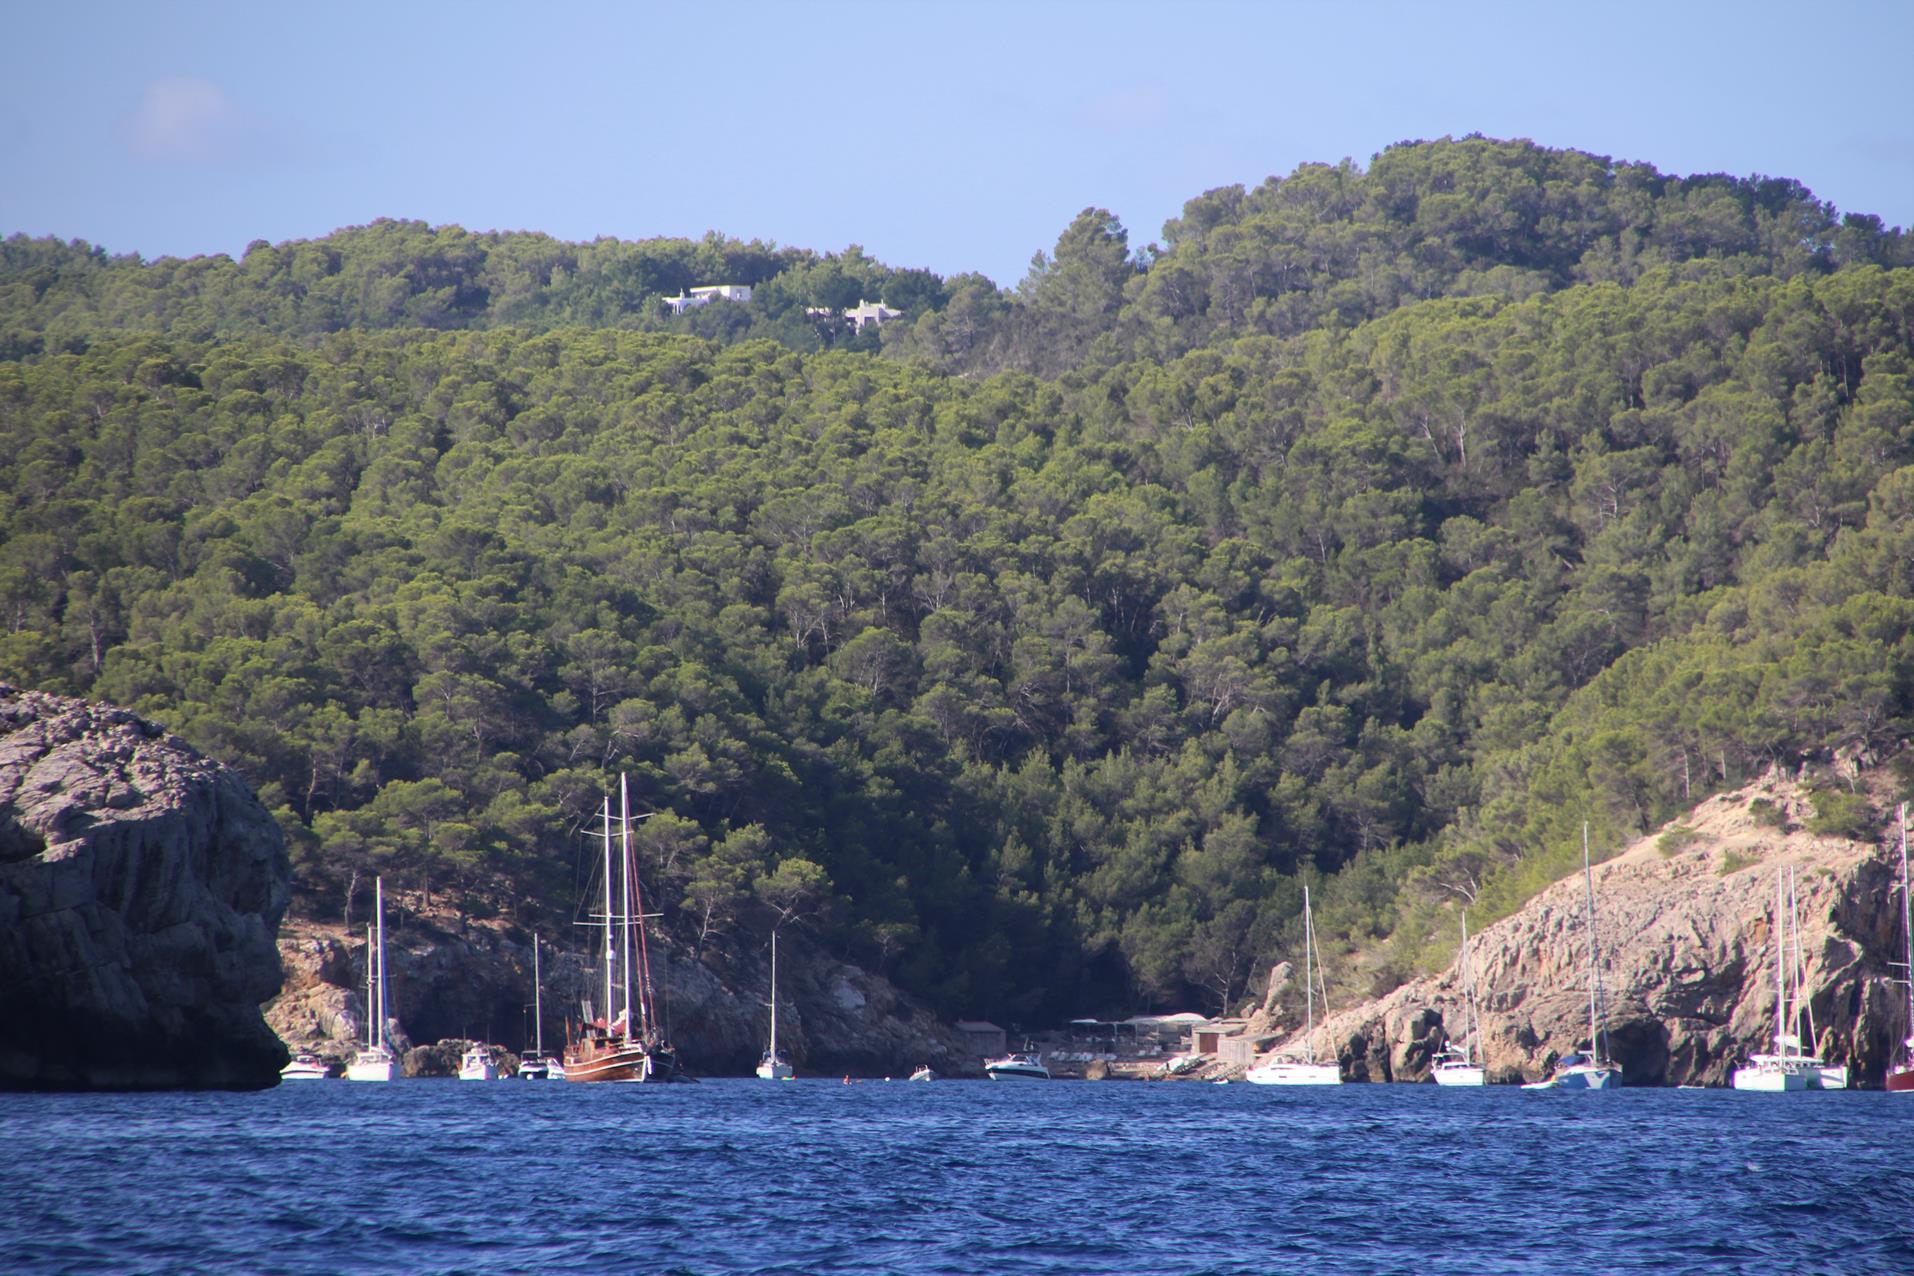 2017-08-21 cala binirris, ibiza island to cala de santa ponsa